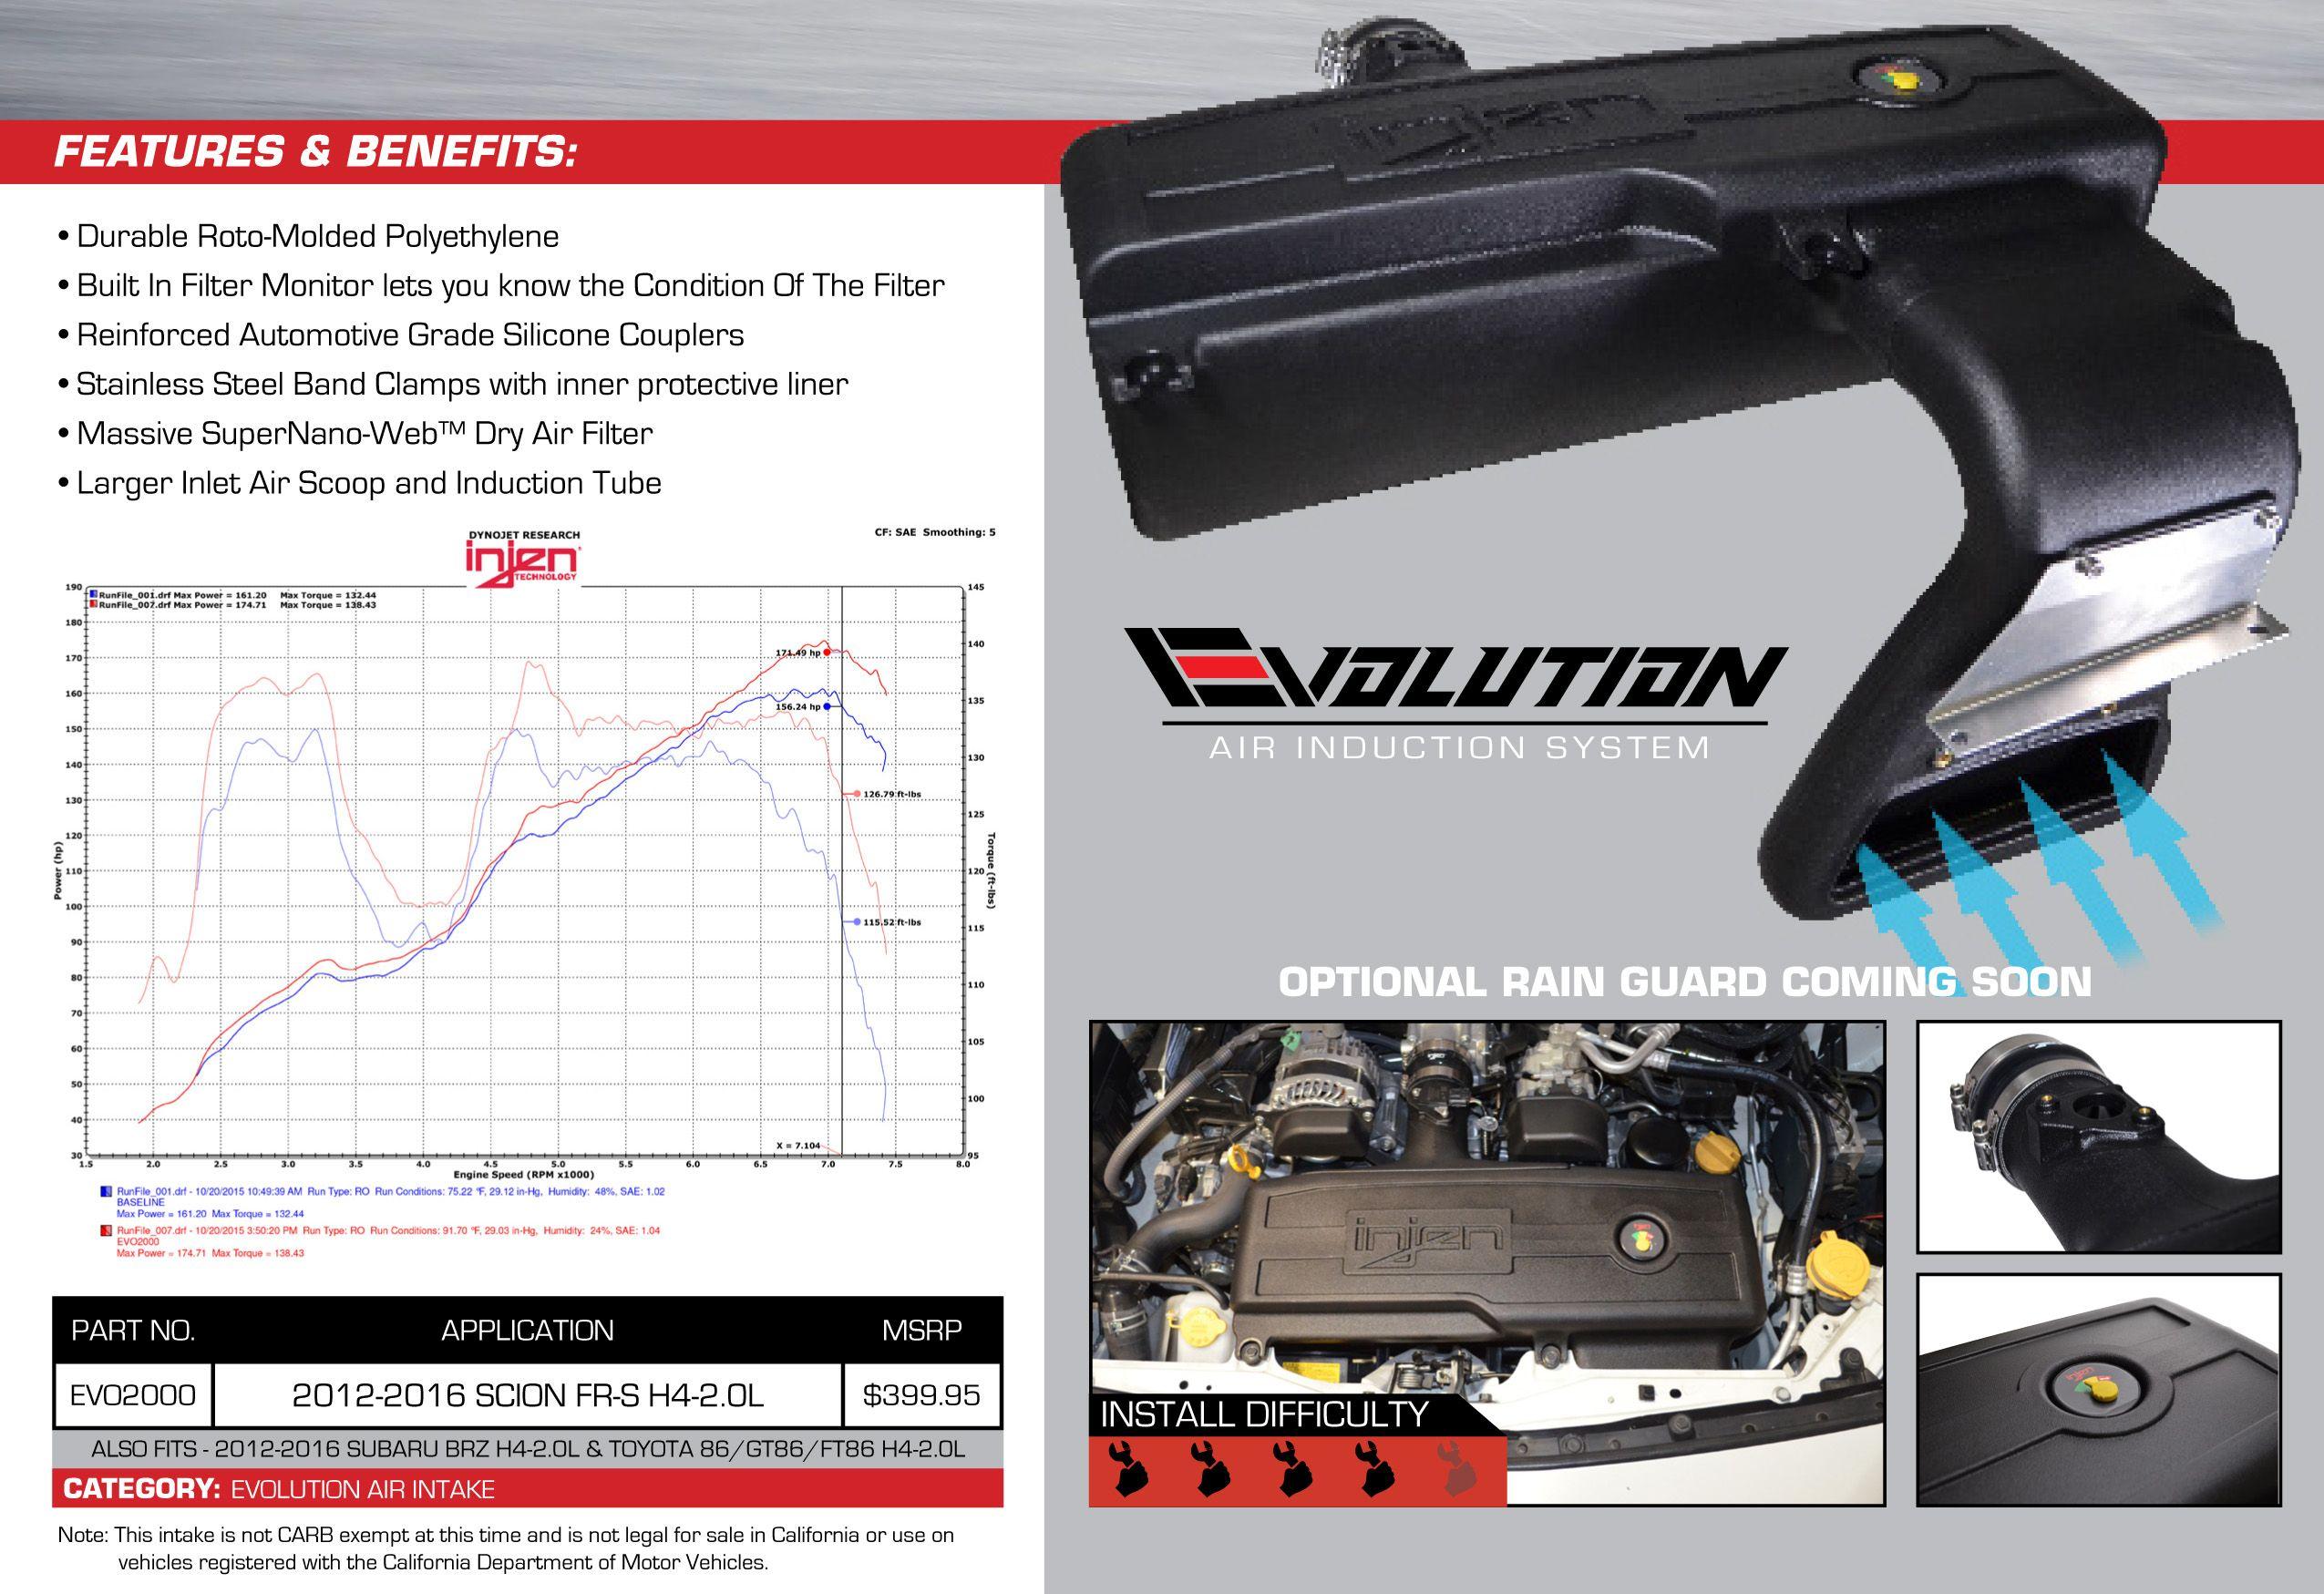 Injen EVO2000 Scion Evolution Air Induction System